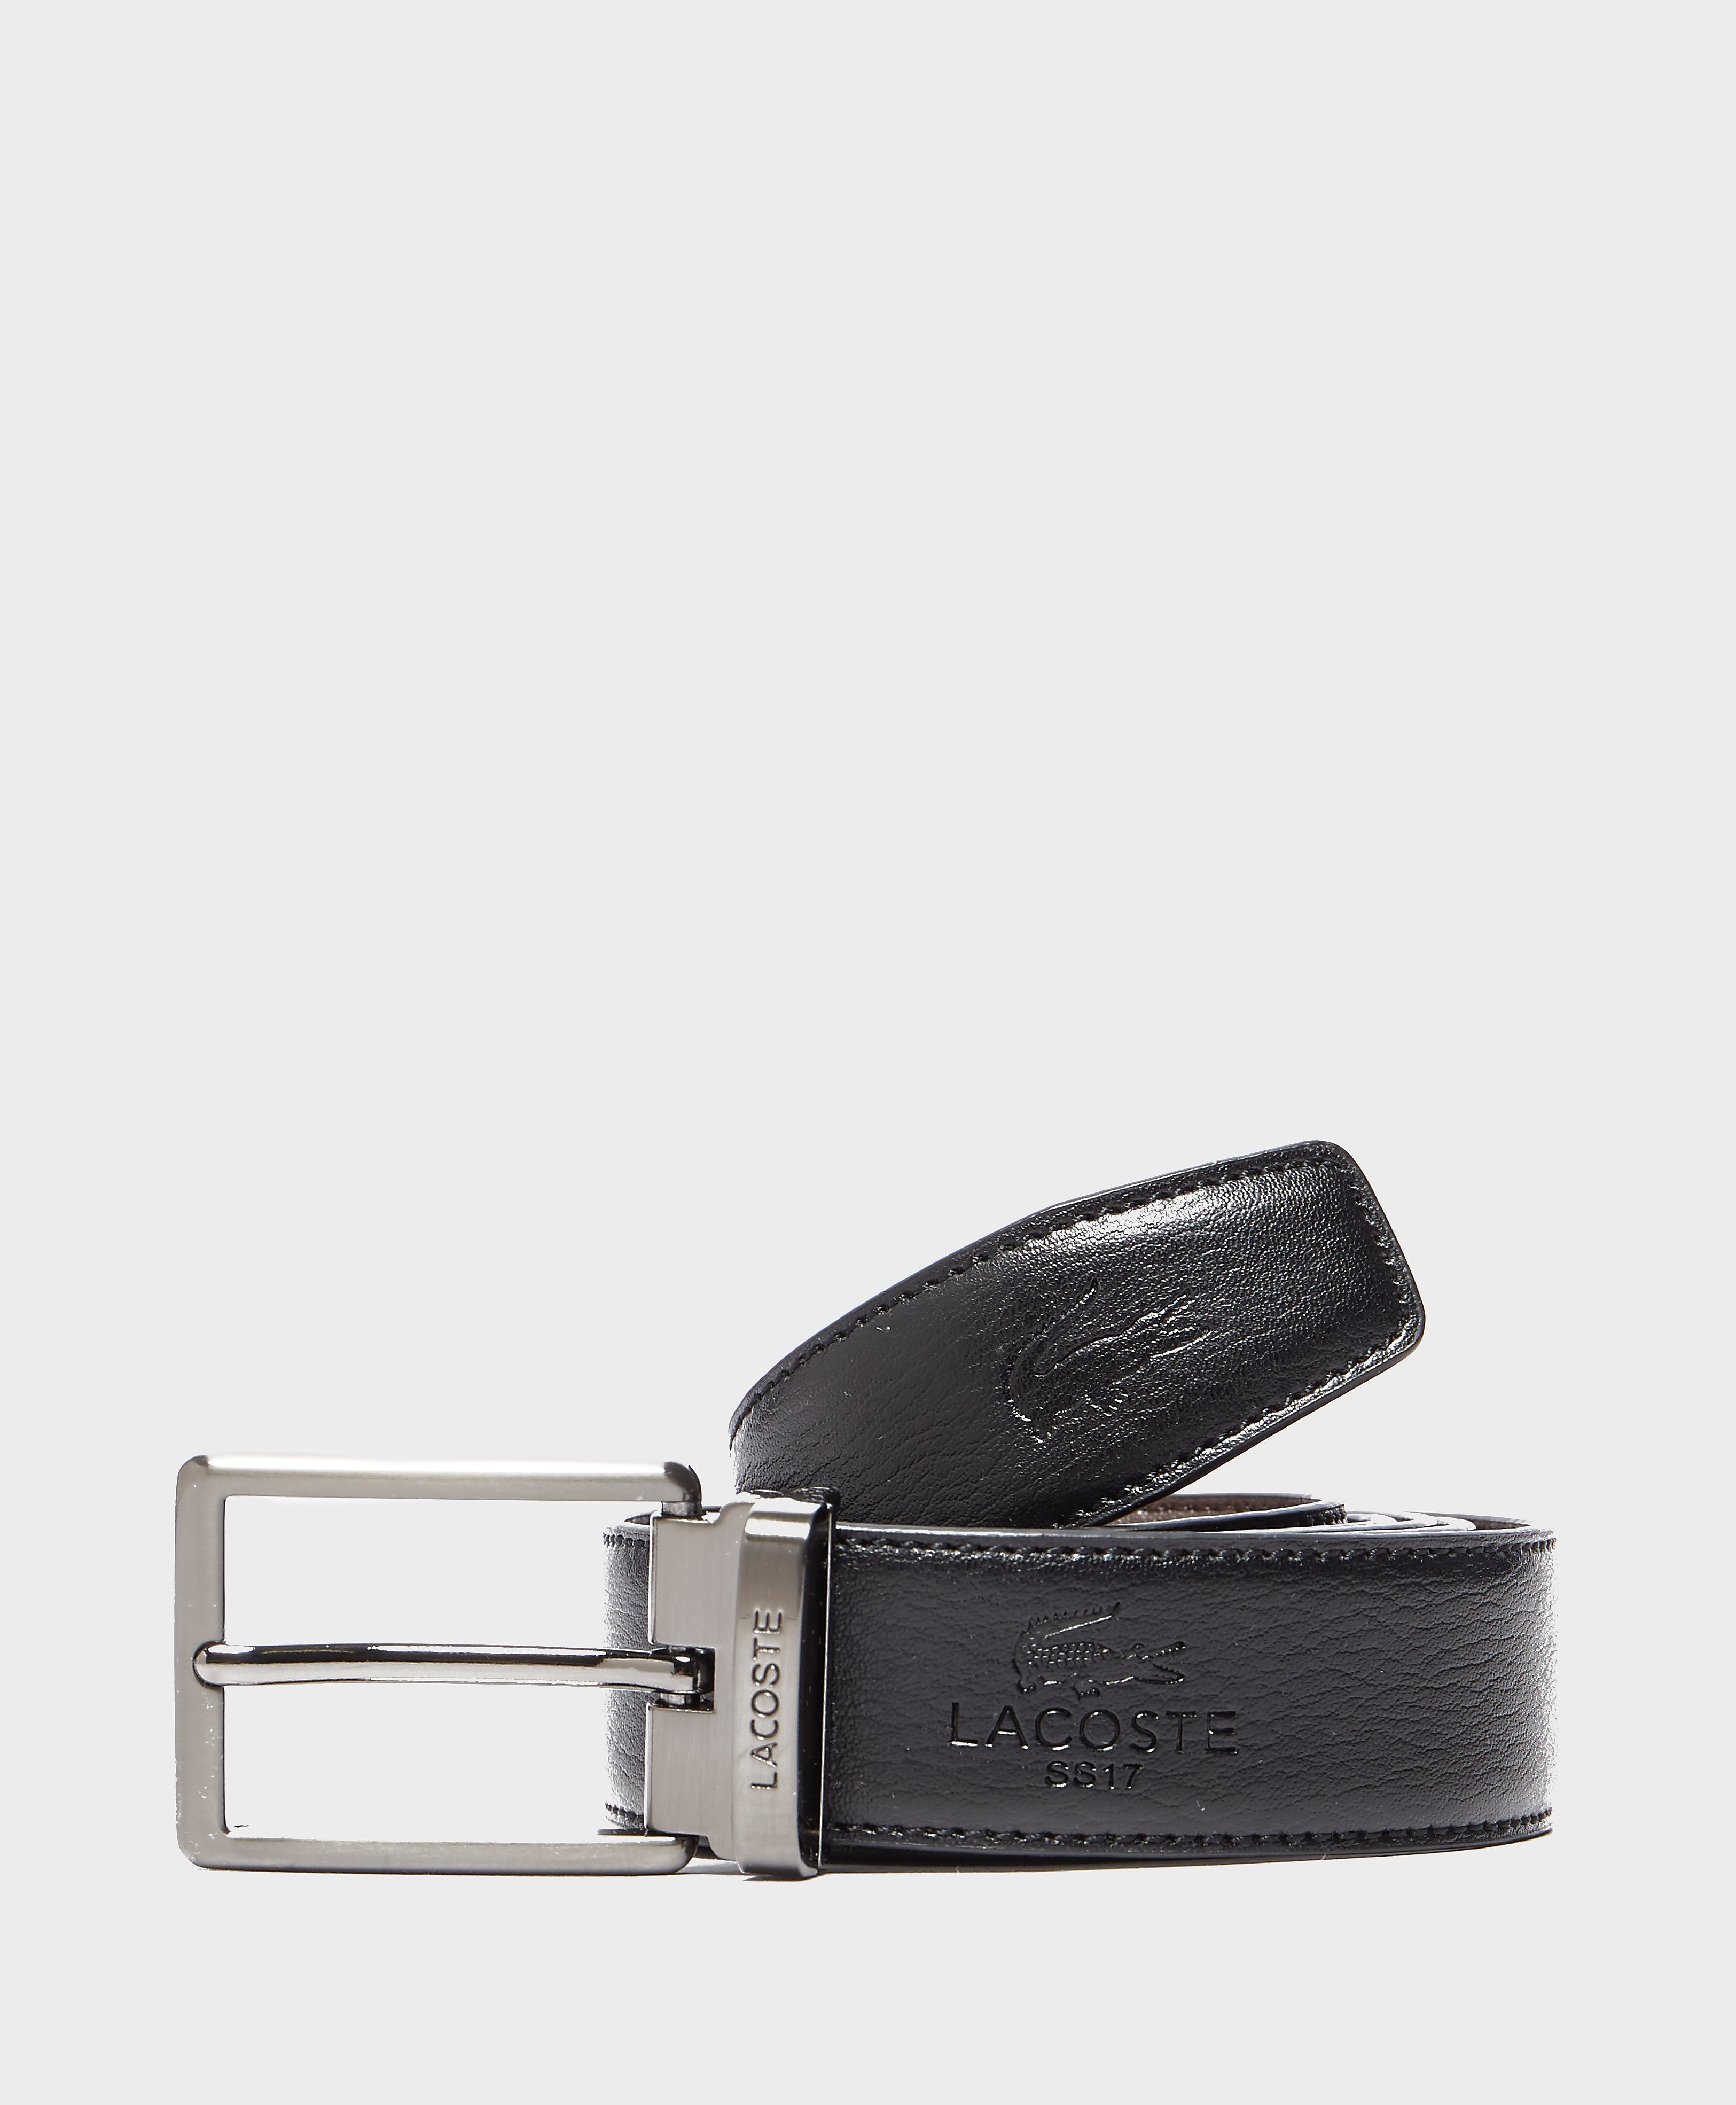 Lacoste Belt Set